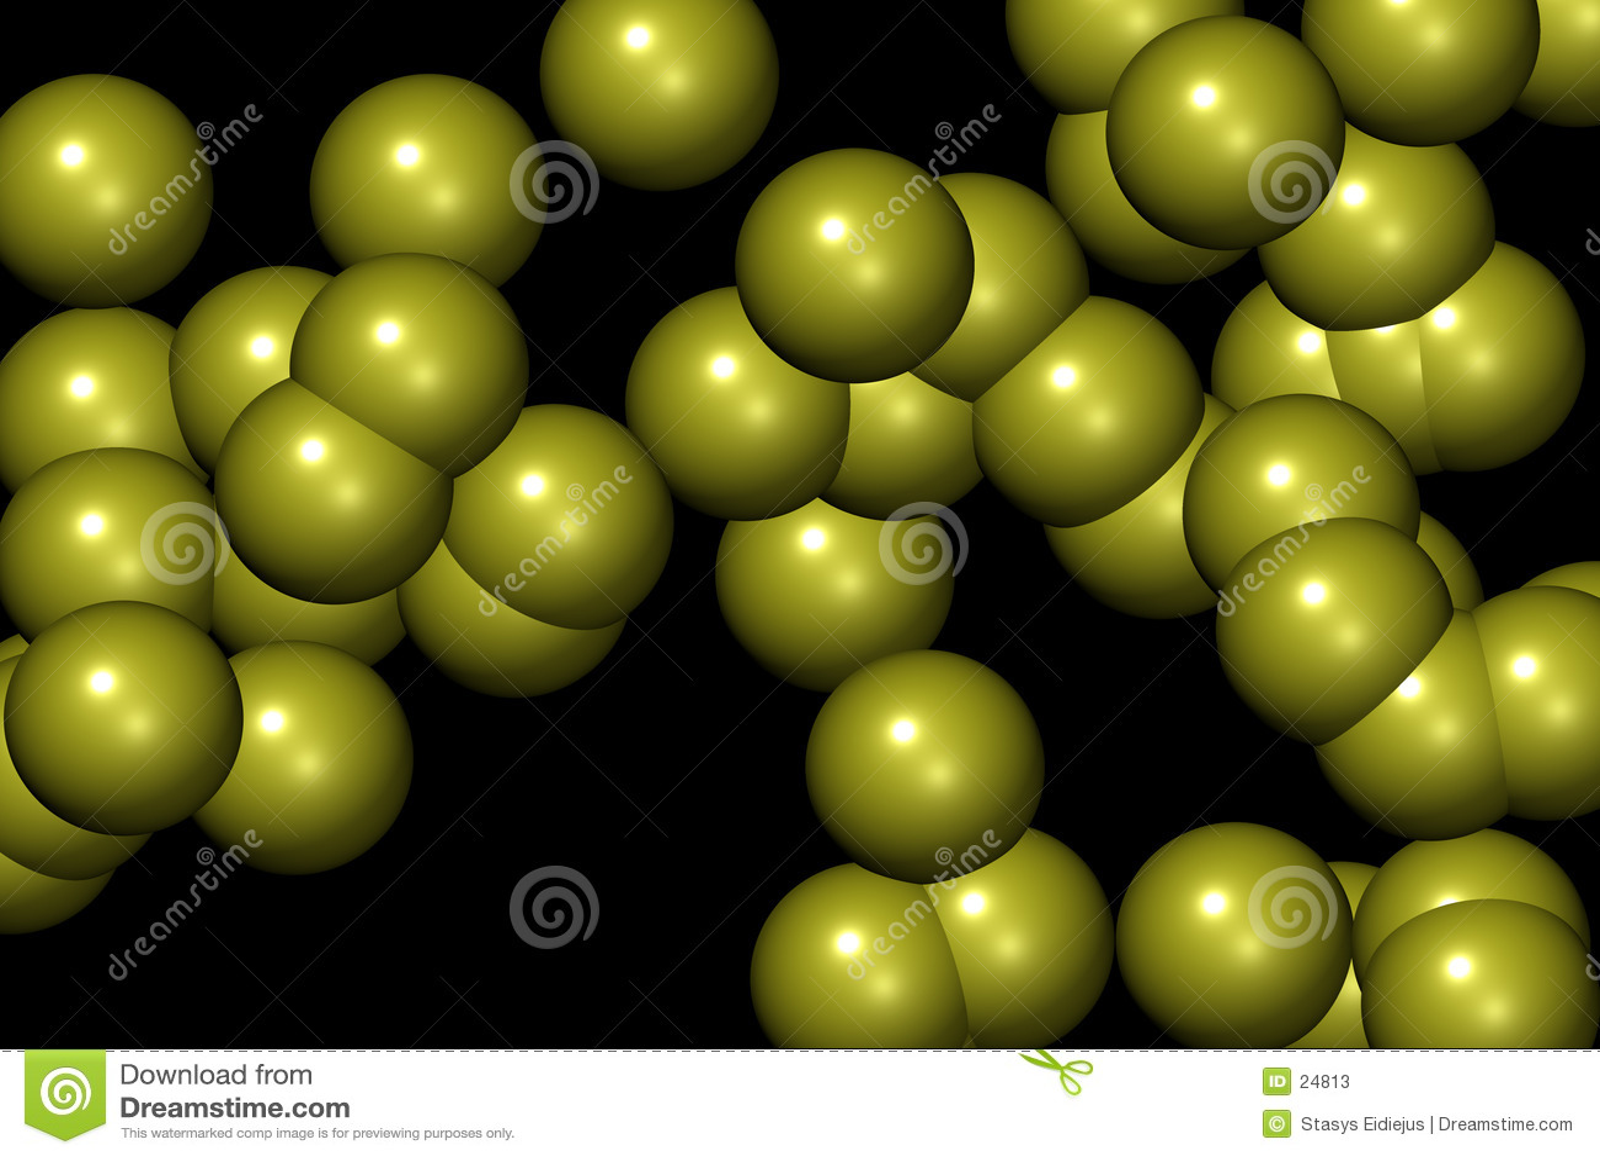 Balls pattern IV